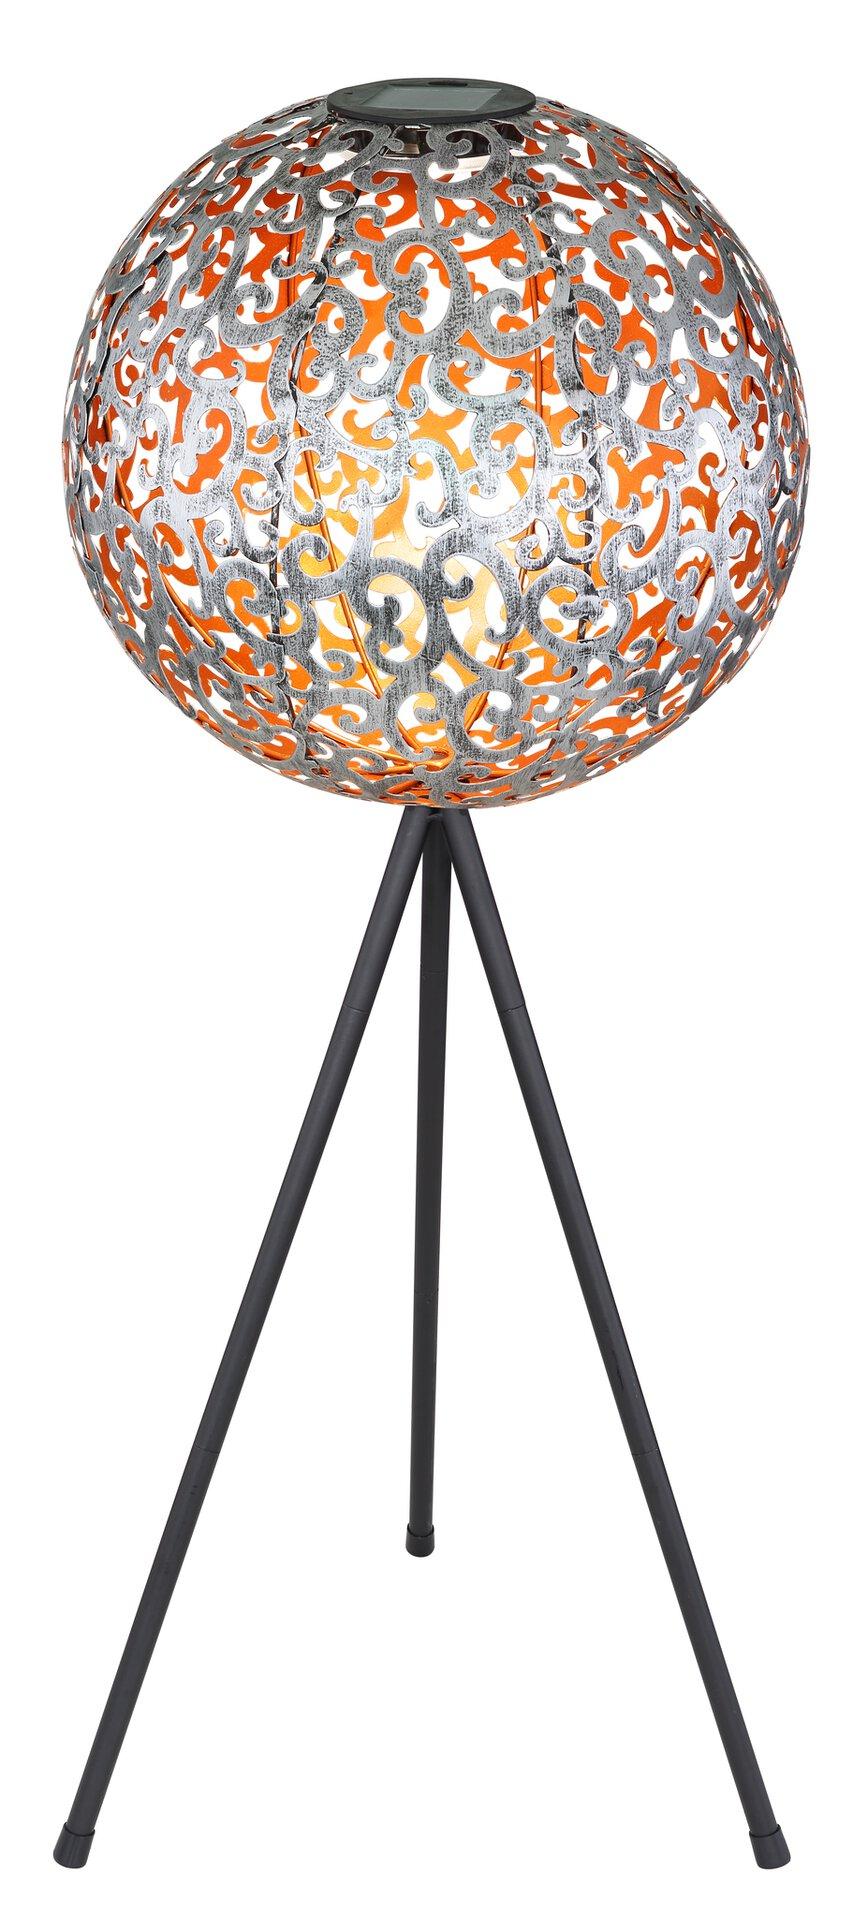 Solarleuchte Solar 3-Bein Globo Metall silber 29 x 80 x 29 cm